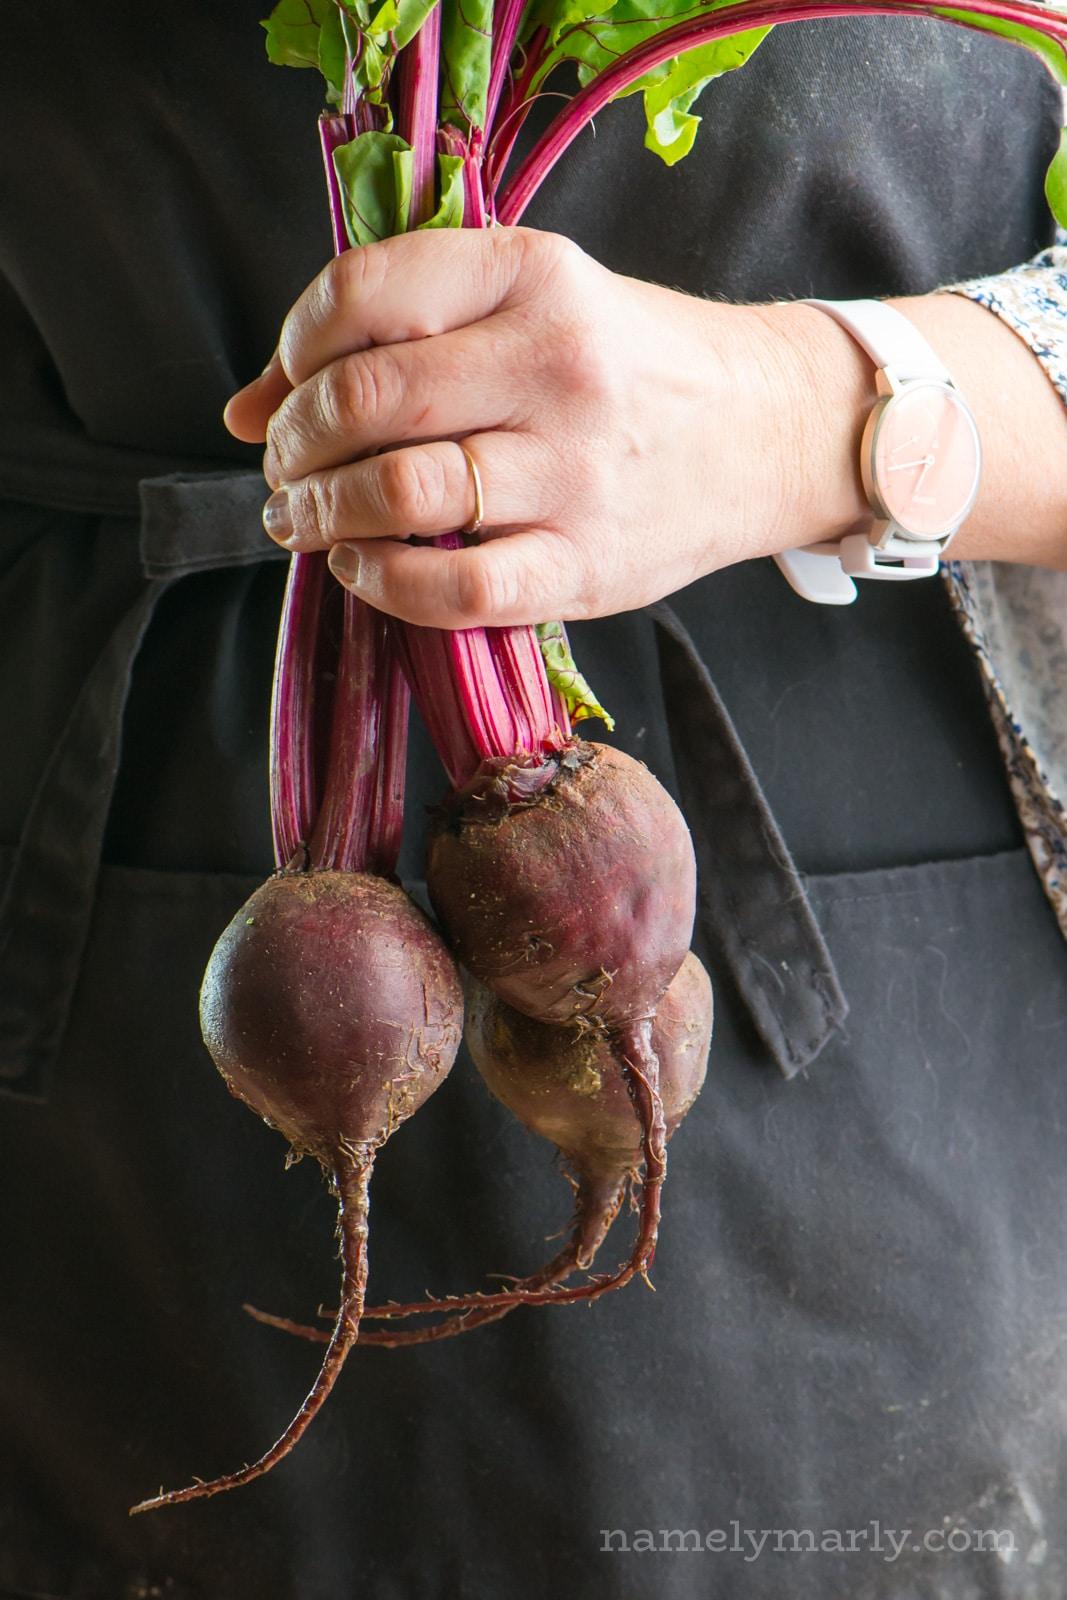 How to make a beet puree